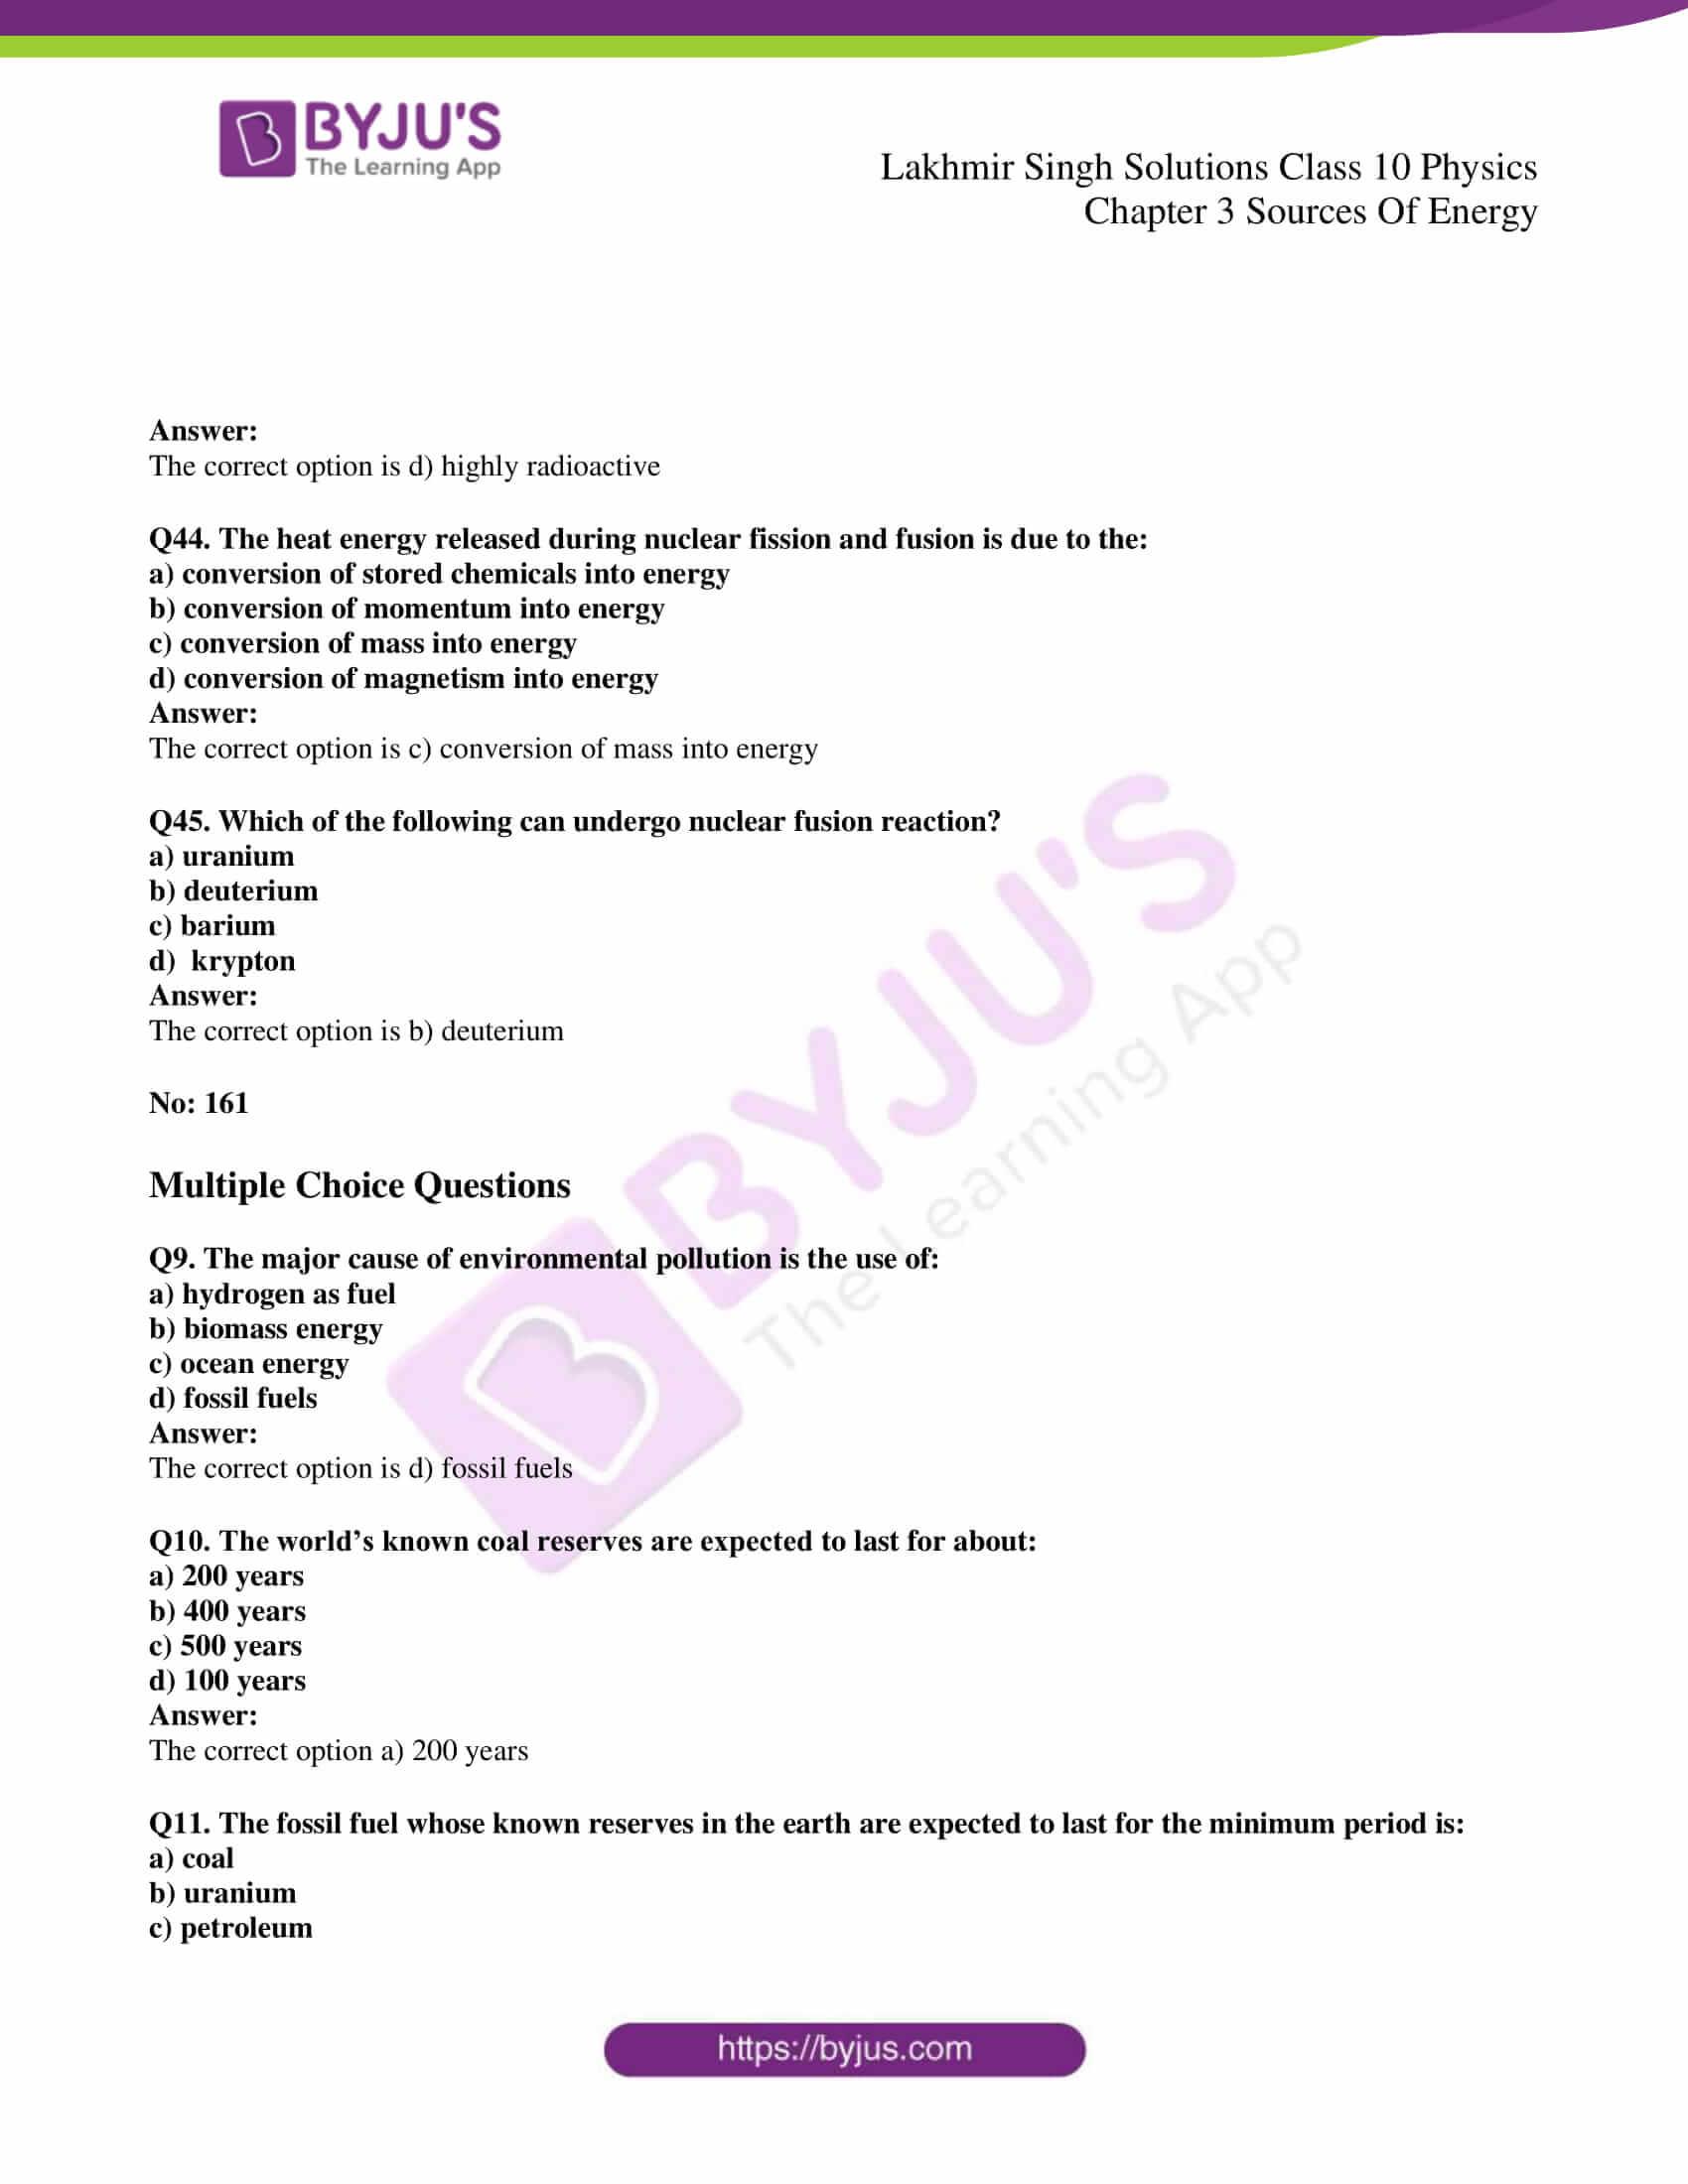 lakhmir singh sol class 10 physics chapter 3 20